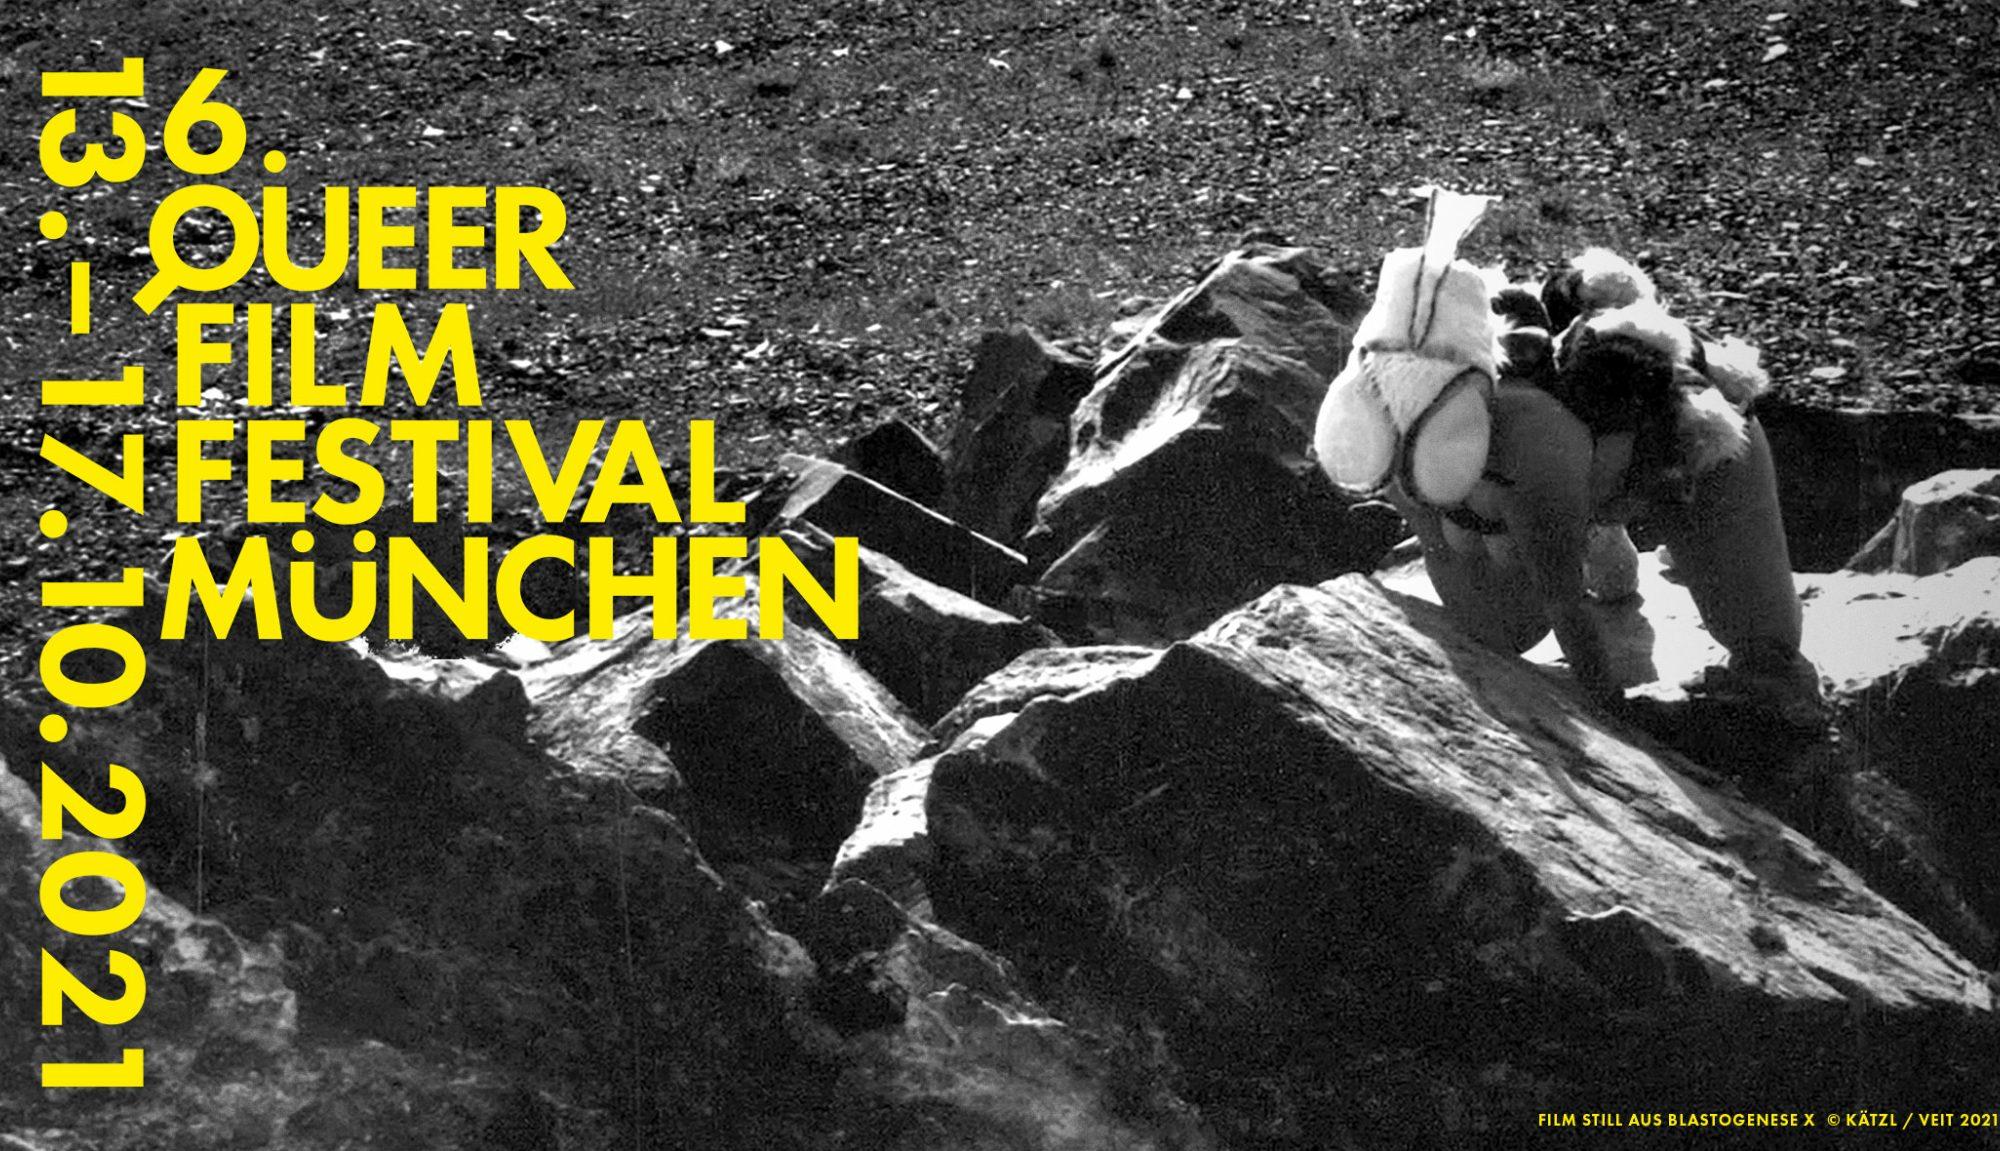 13.10.2021 - 17.10.2021 6. Queer Film Festival München